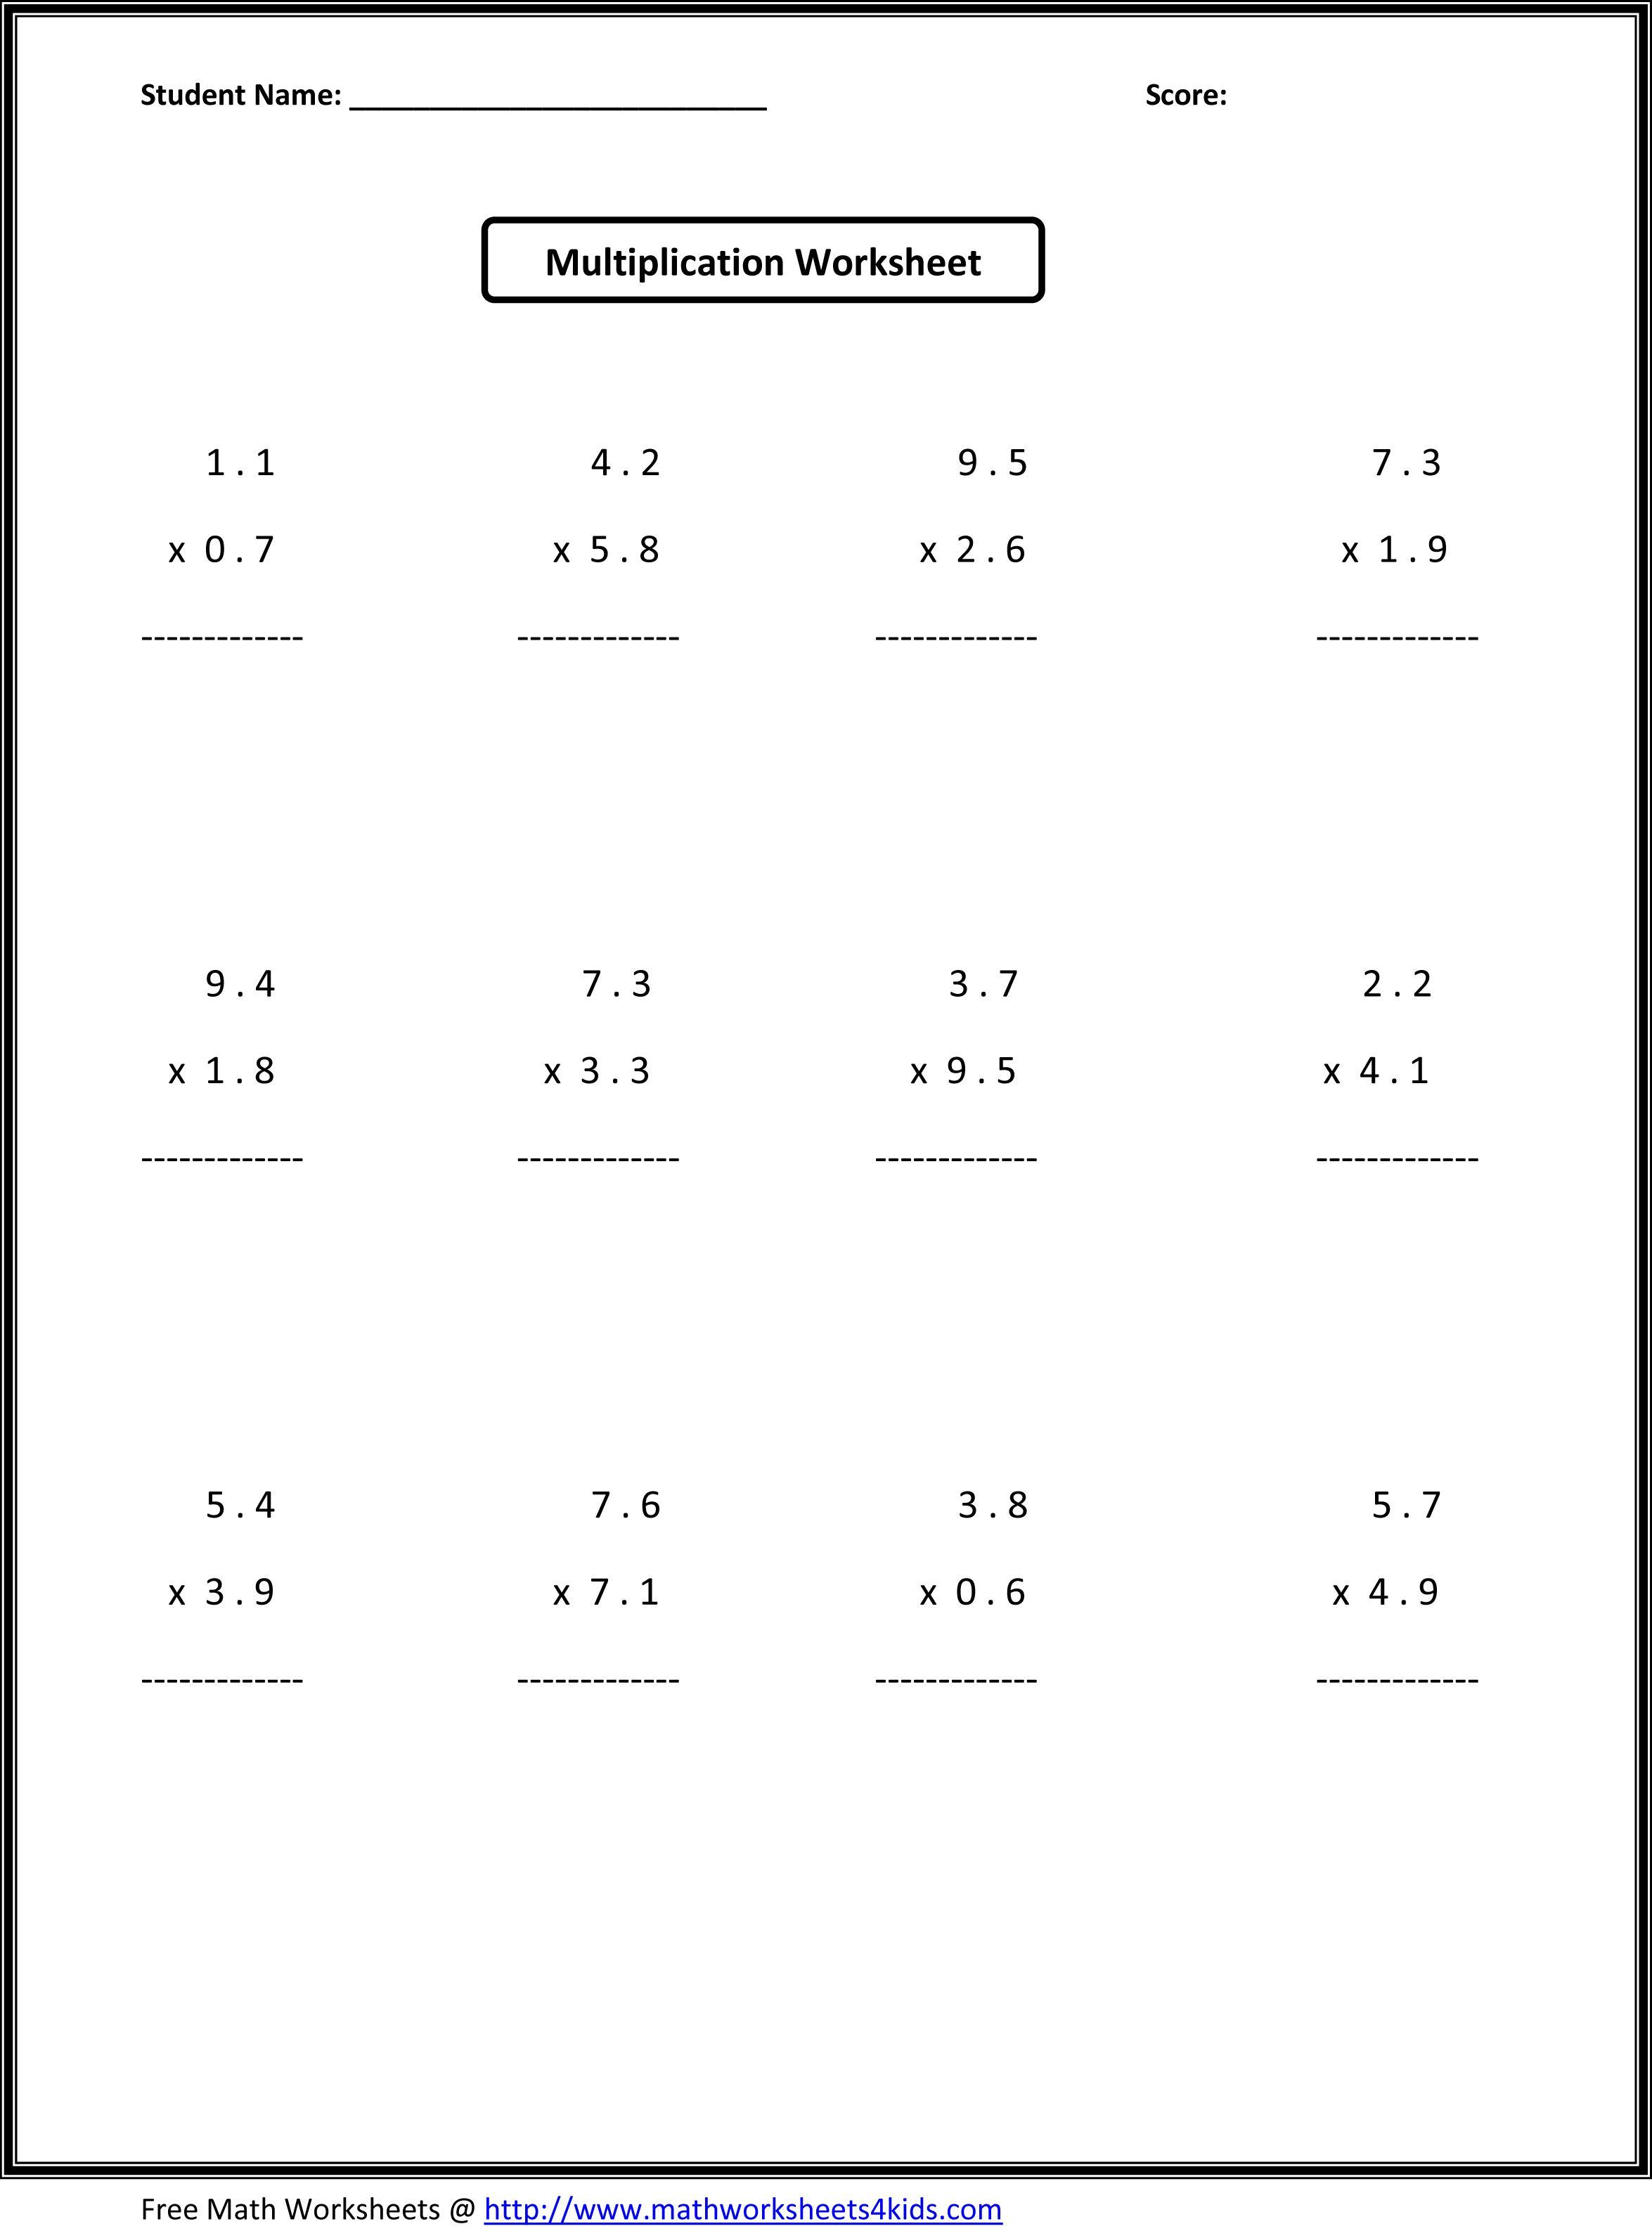 7Th Grade Math Worksheets | Value Worksheets Absolute Value | 7Th Math Worksheets Printable